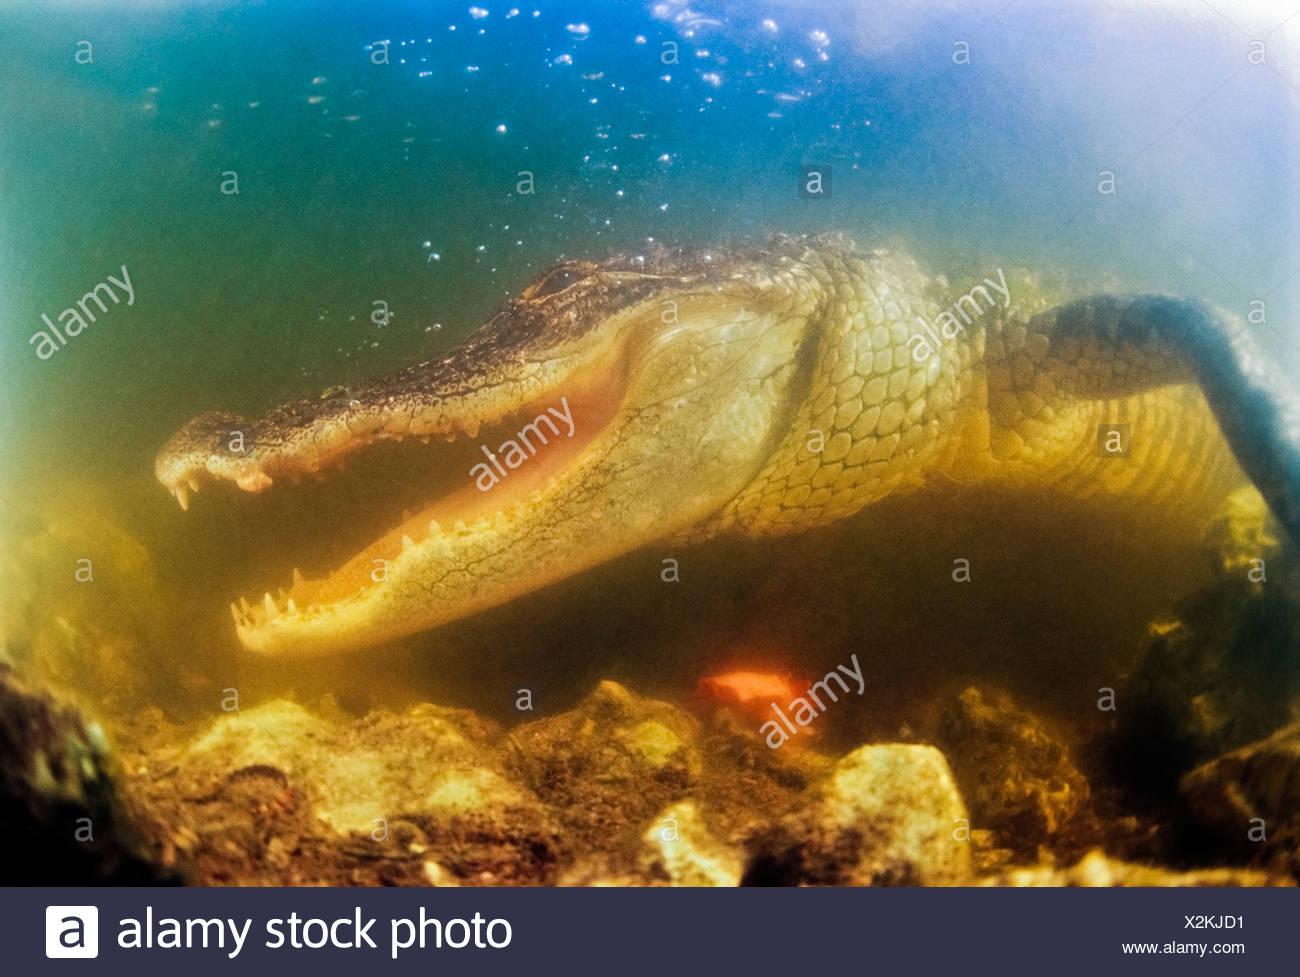 Amerikanischer Alligator mit Jaws agape Stockbild